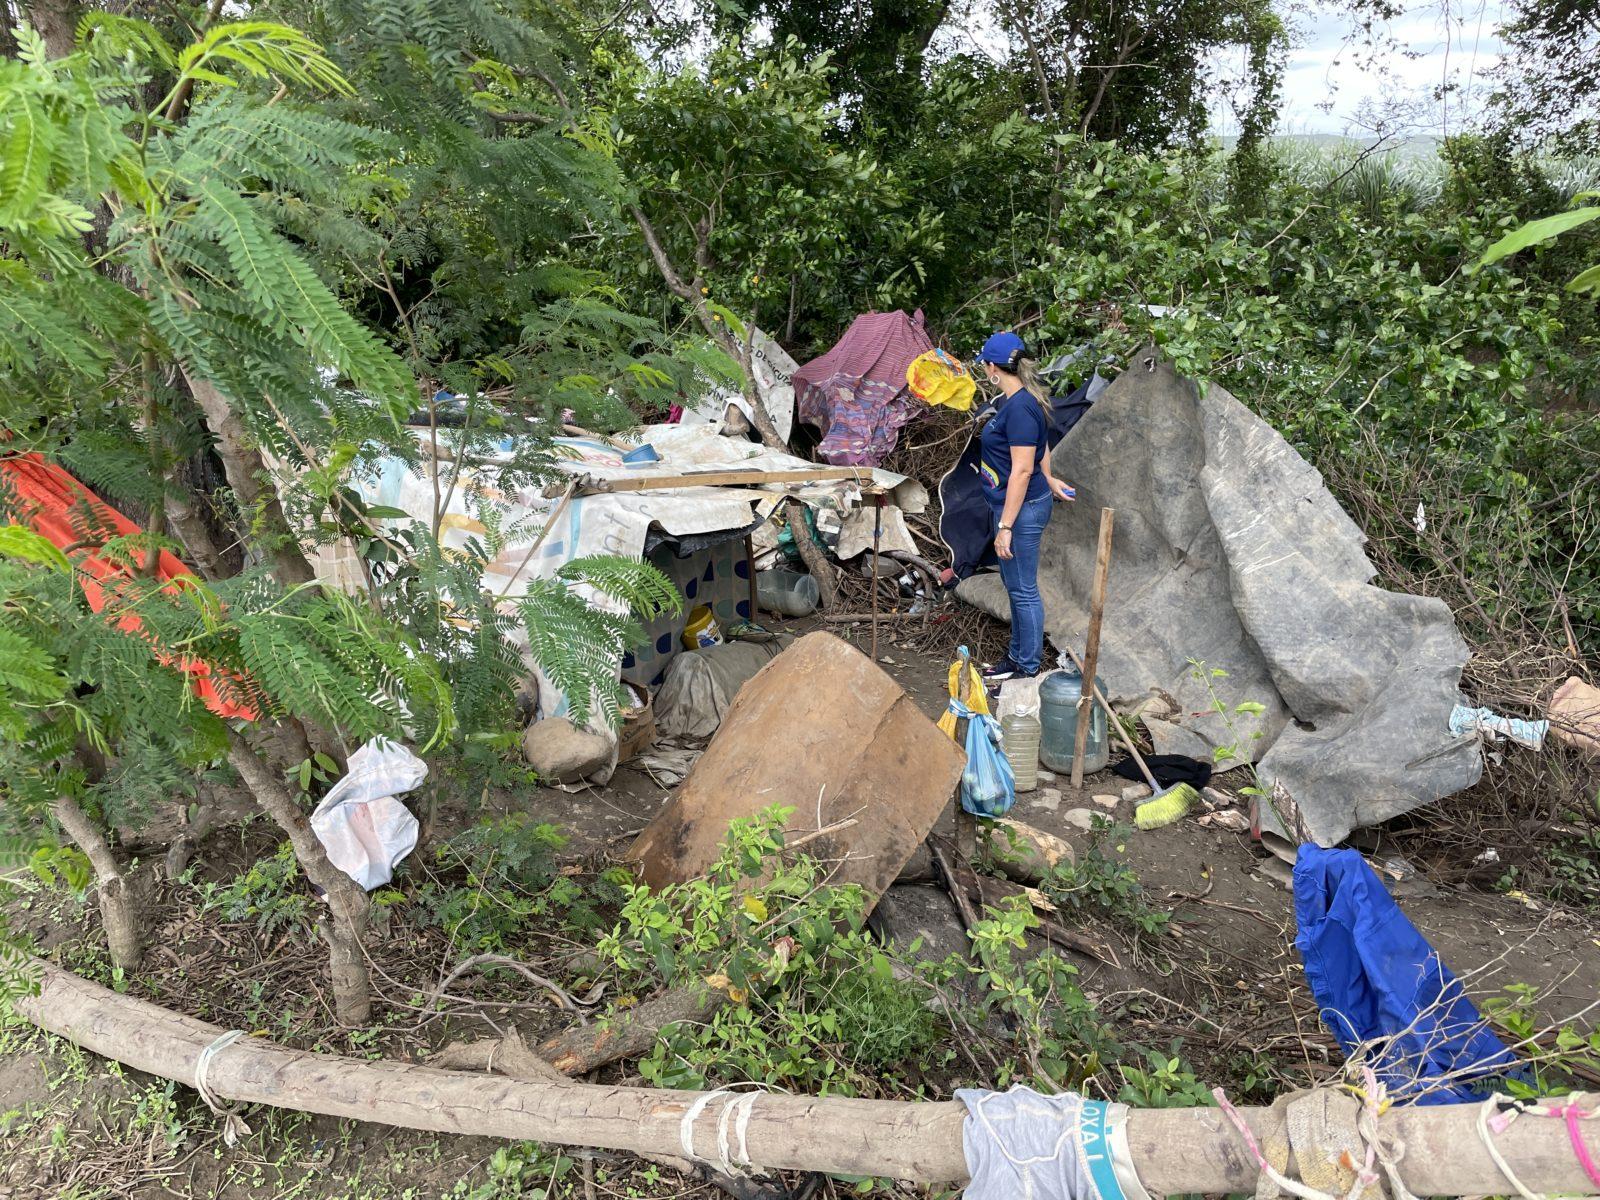 venezuelan camp